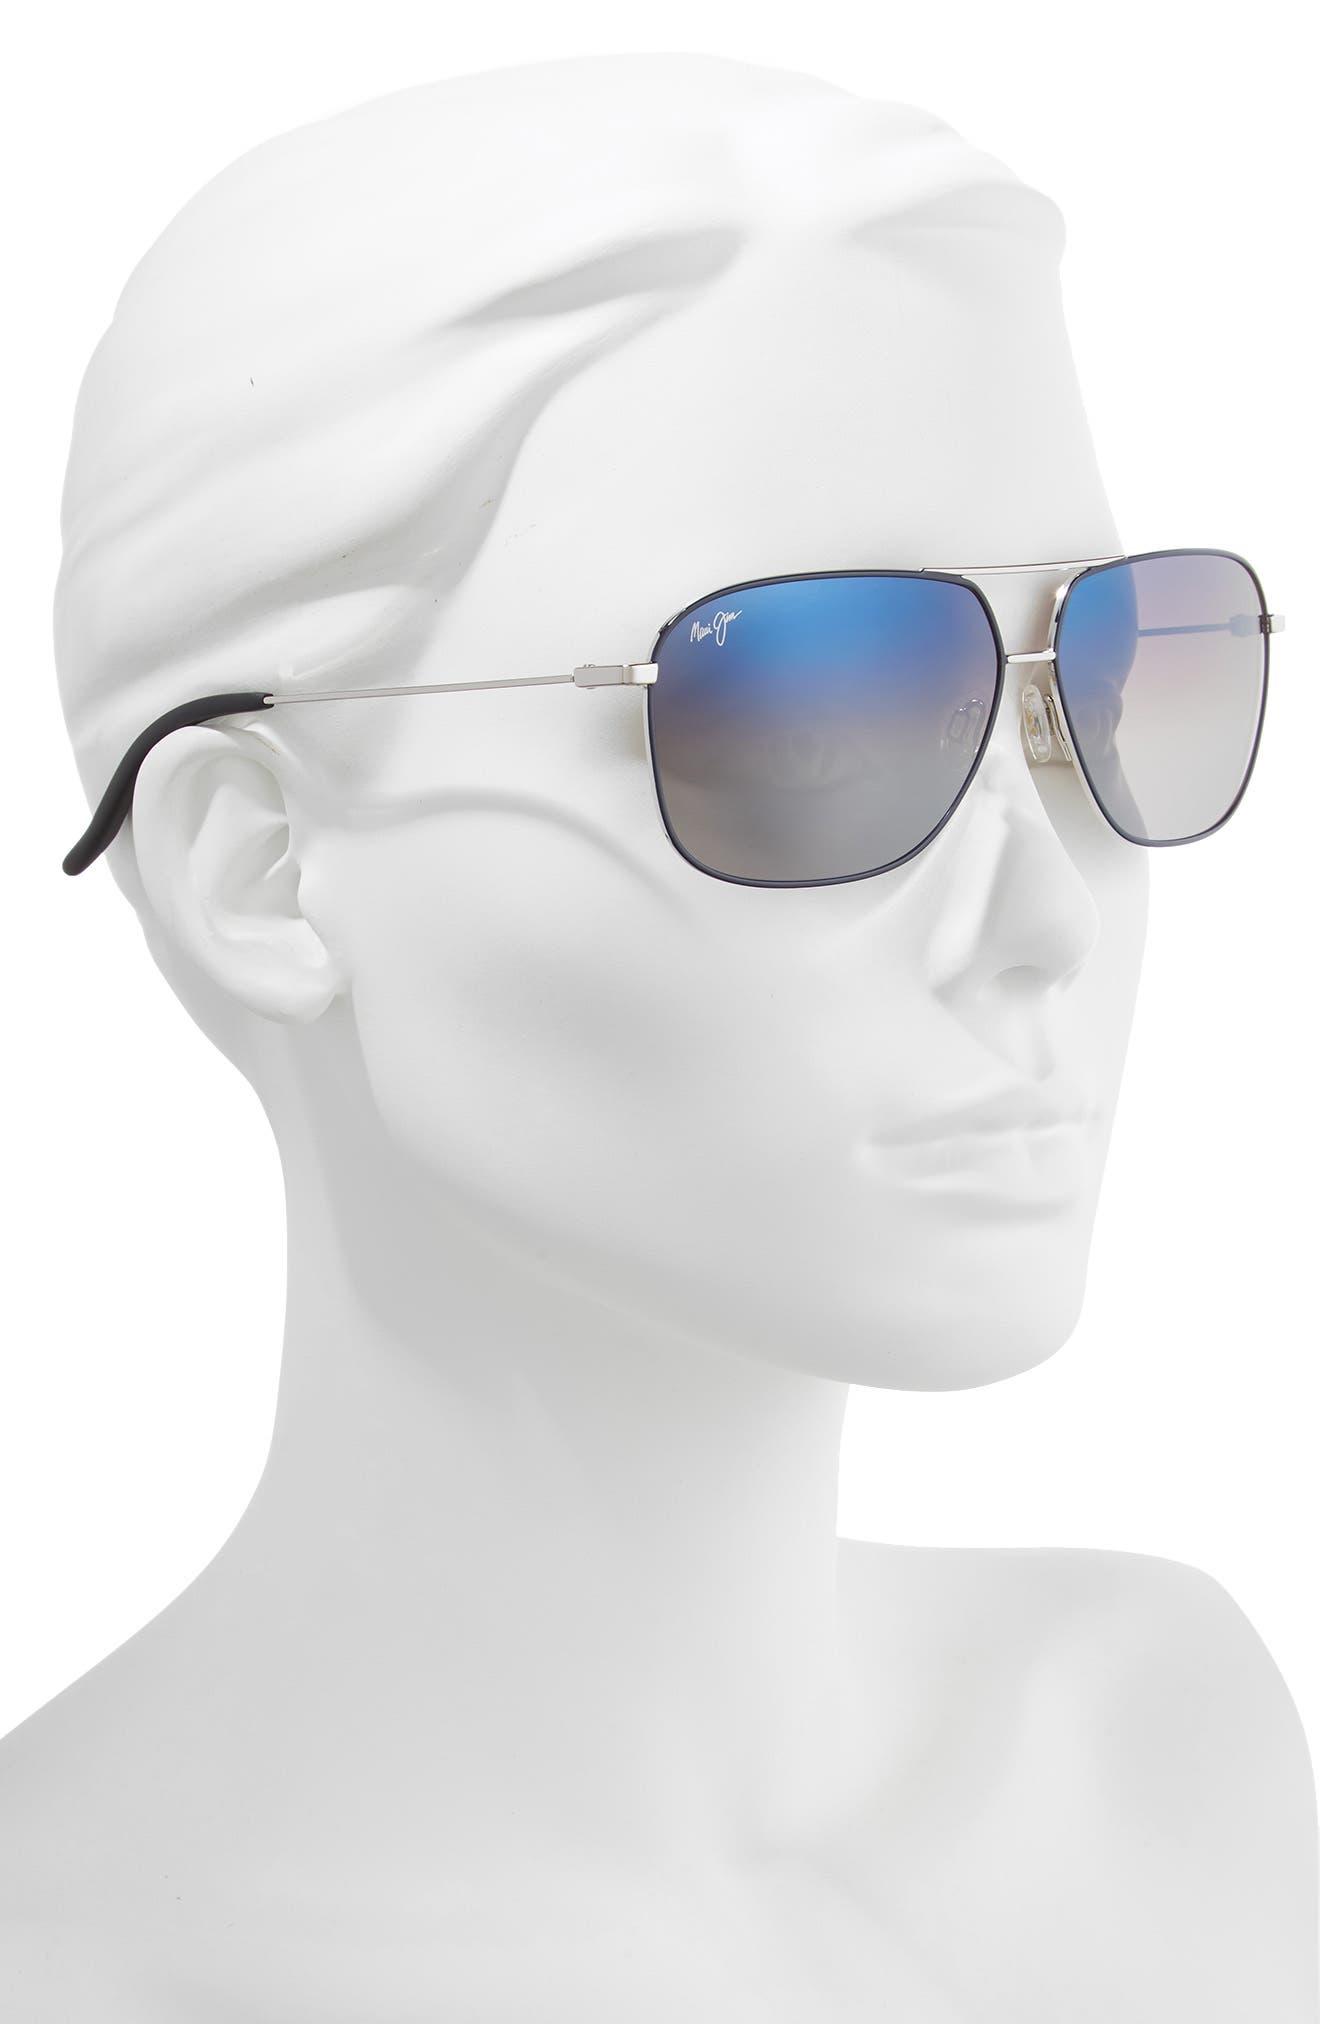 Kami 62mm PolarizedPlus2<sup>®</sup> Aviator Sunglasses,                             Alternate thumbnail 2, color,                             SILVER NAVY BLUE/DUAL MIRR